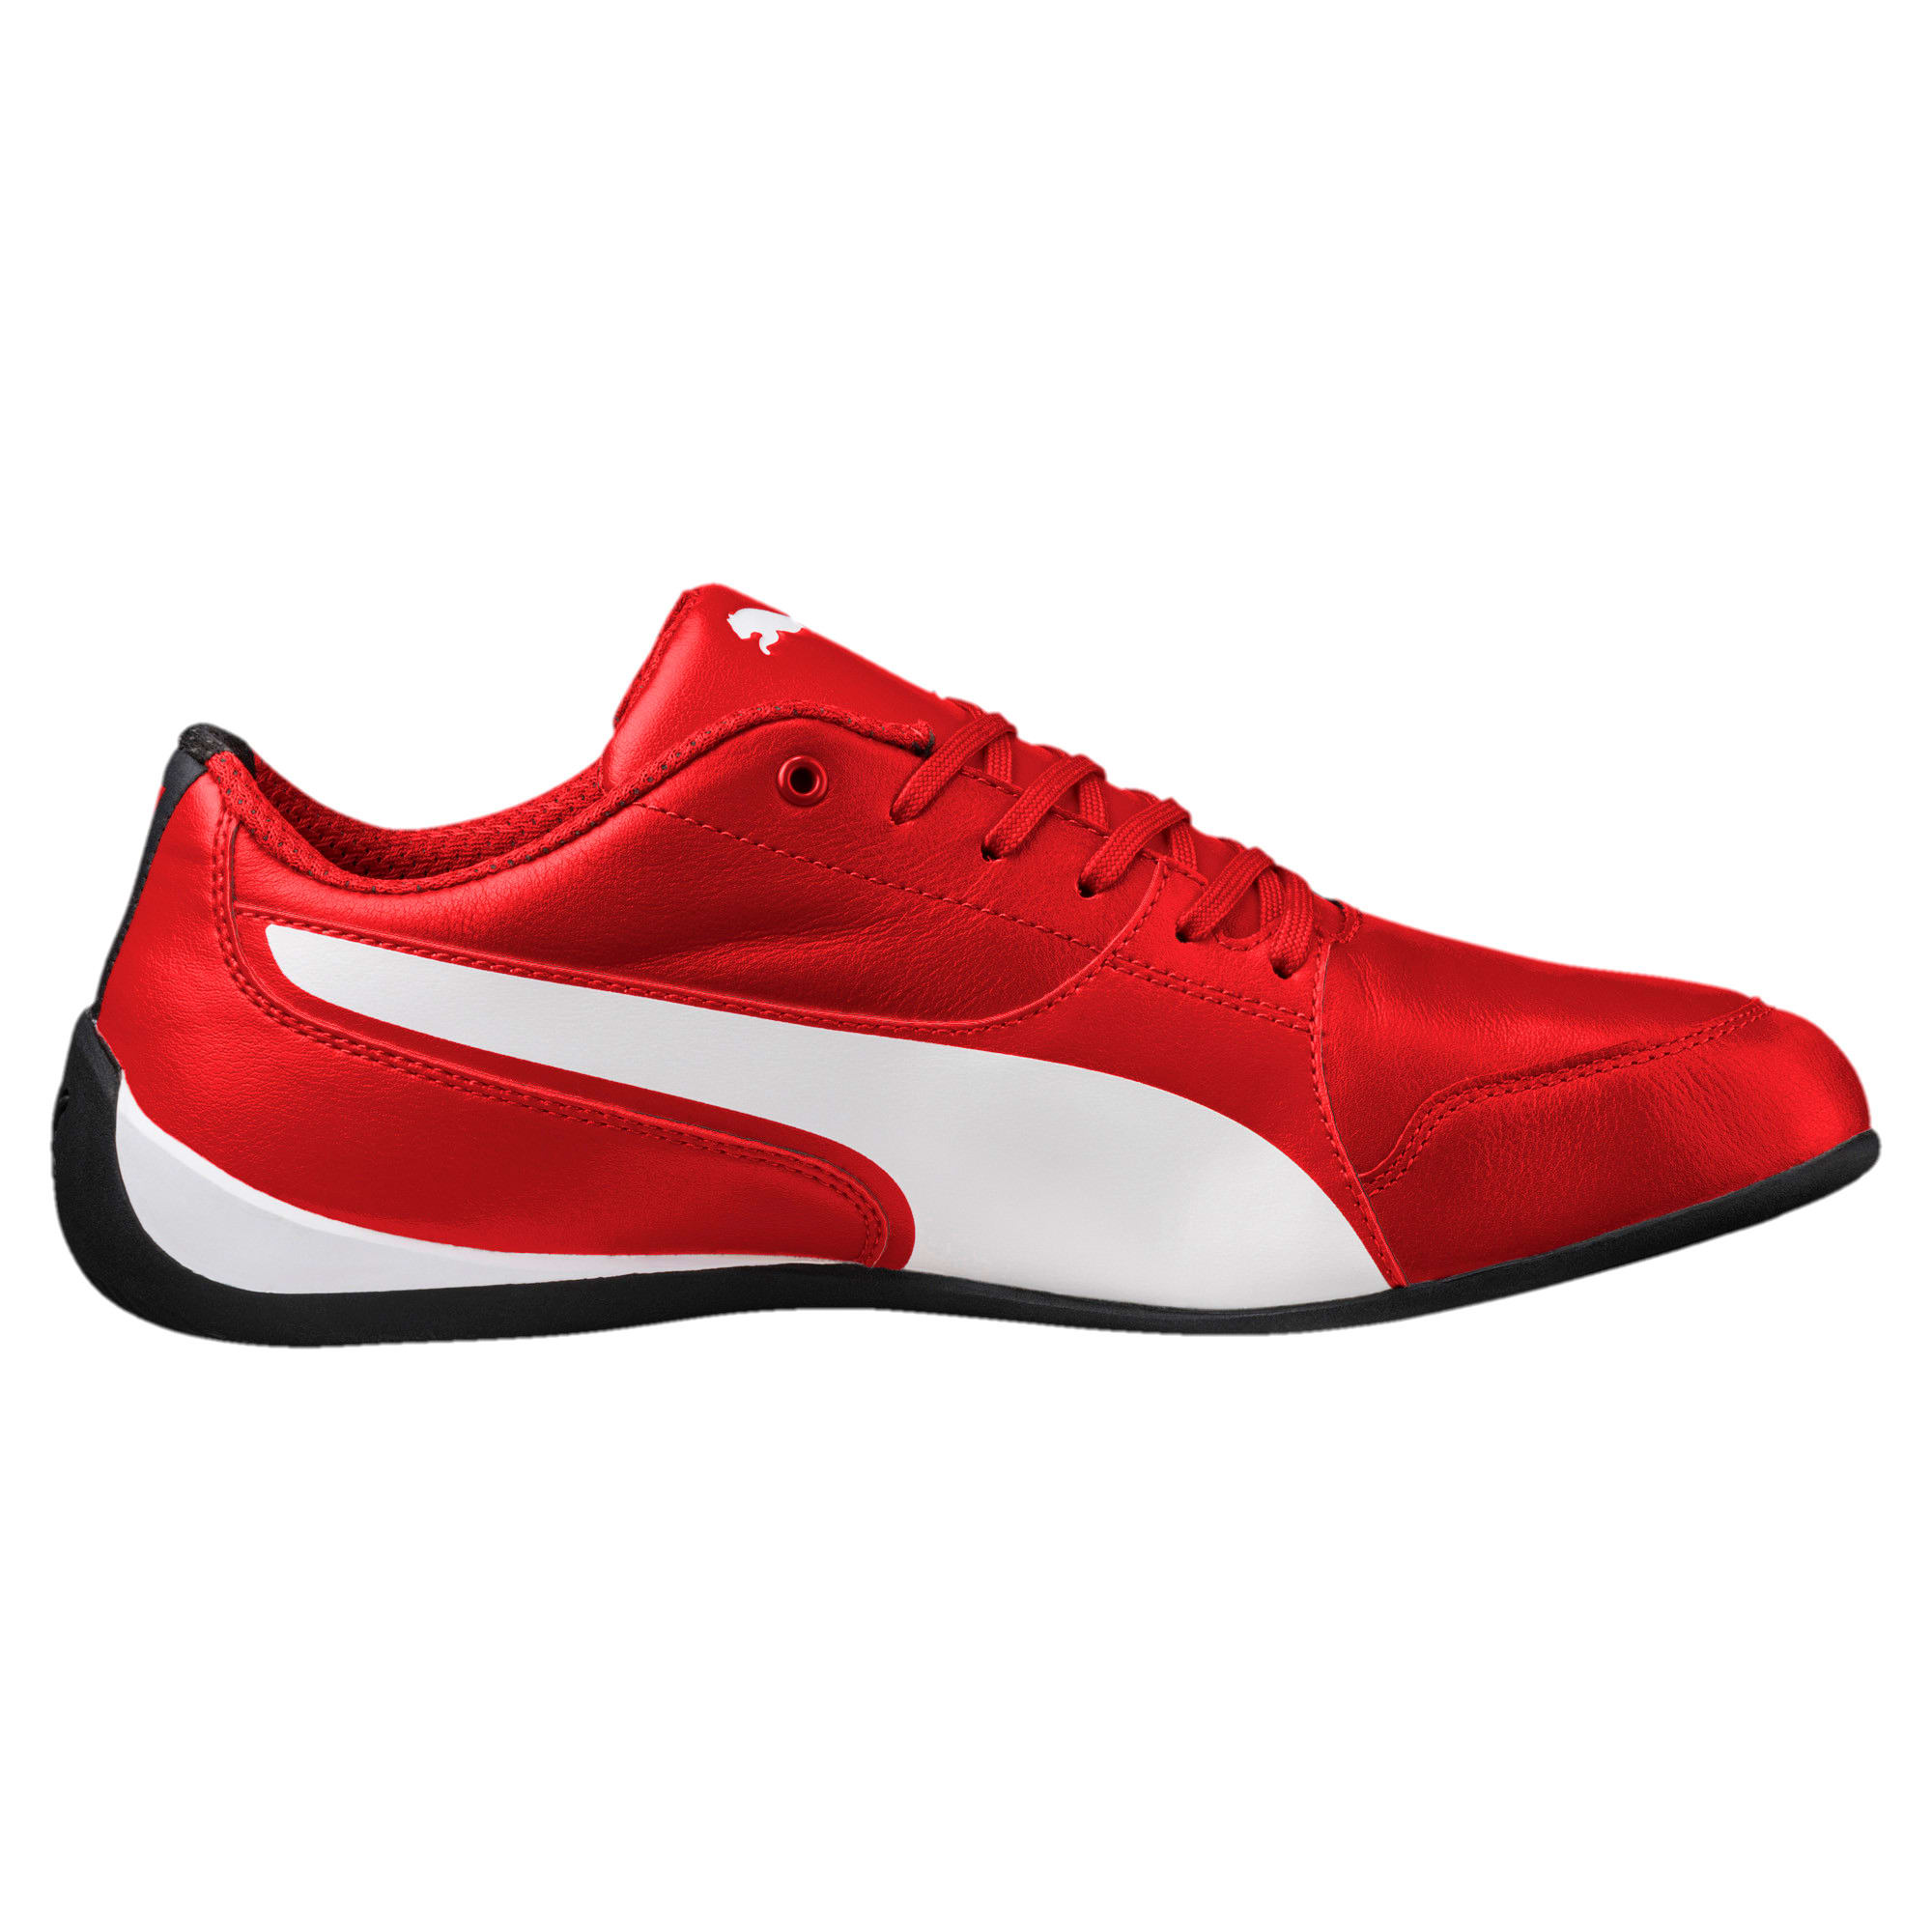 Thumbnail 3 of Scuderia Ferrari Drift Cat 7 Shoes, Rosso Corsa-Puma White-Black, medium